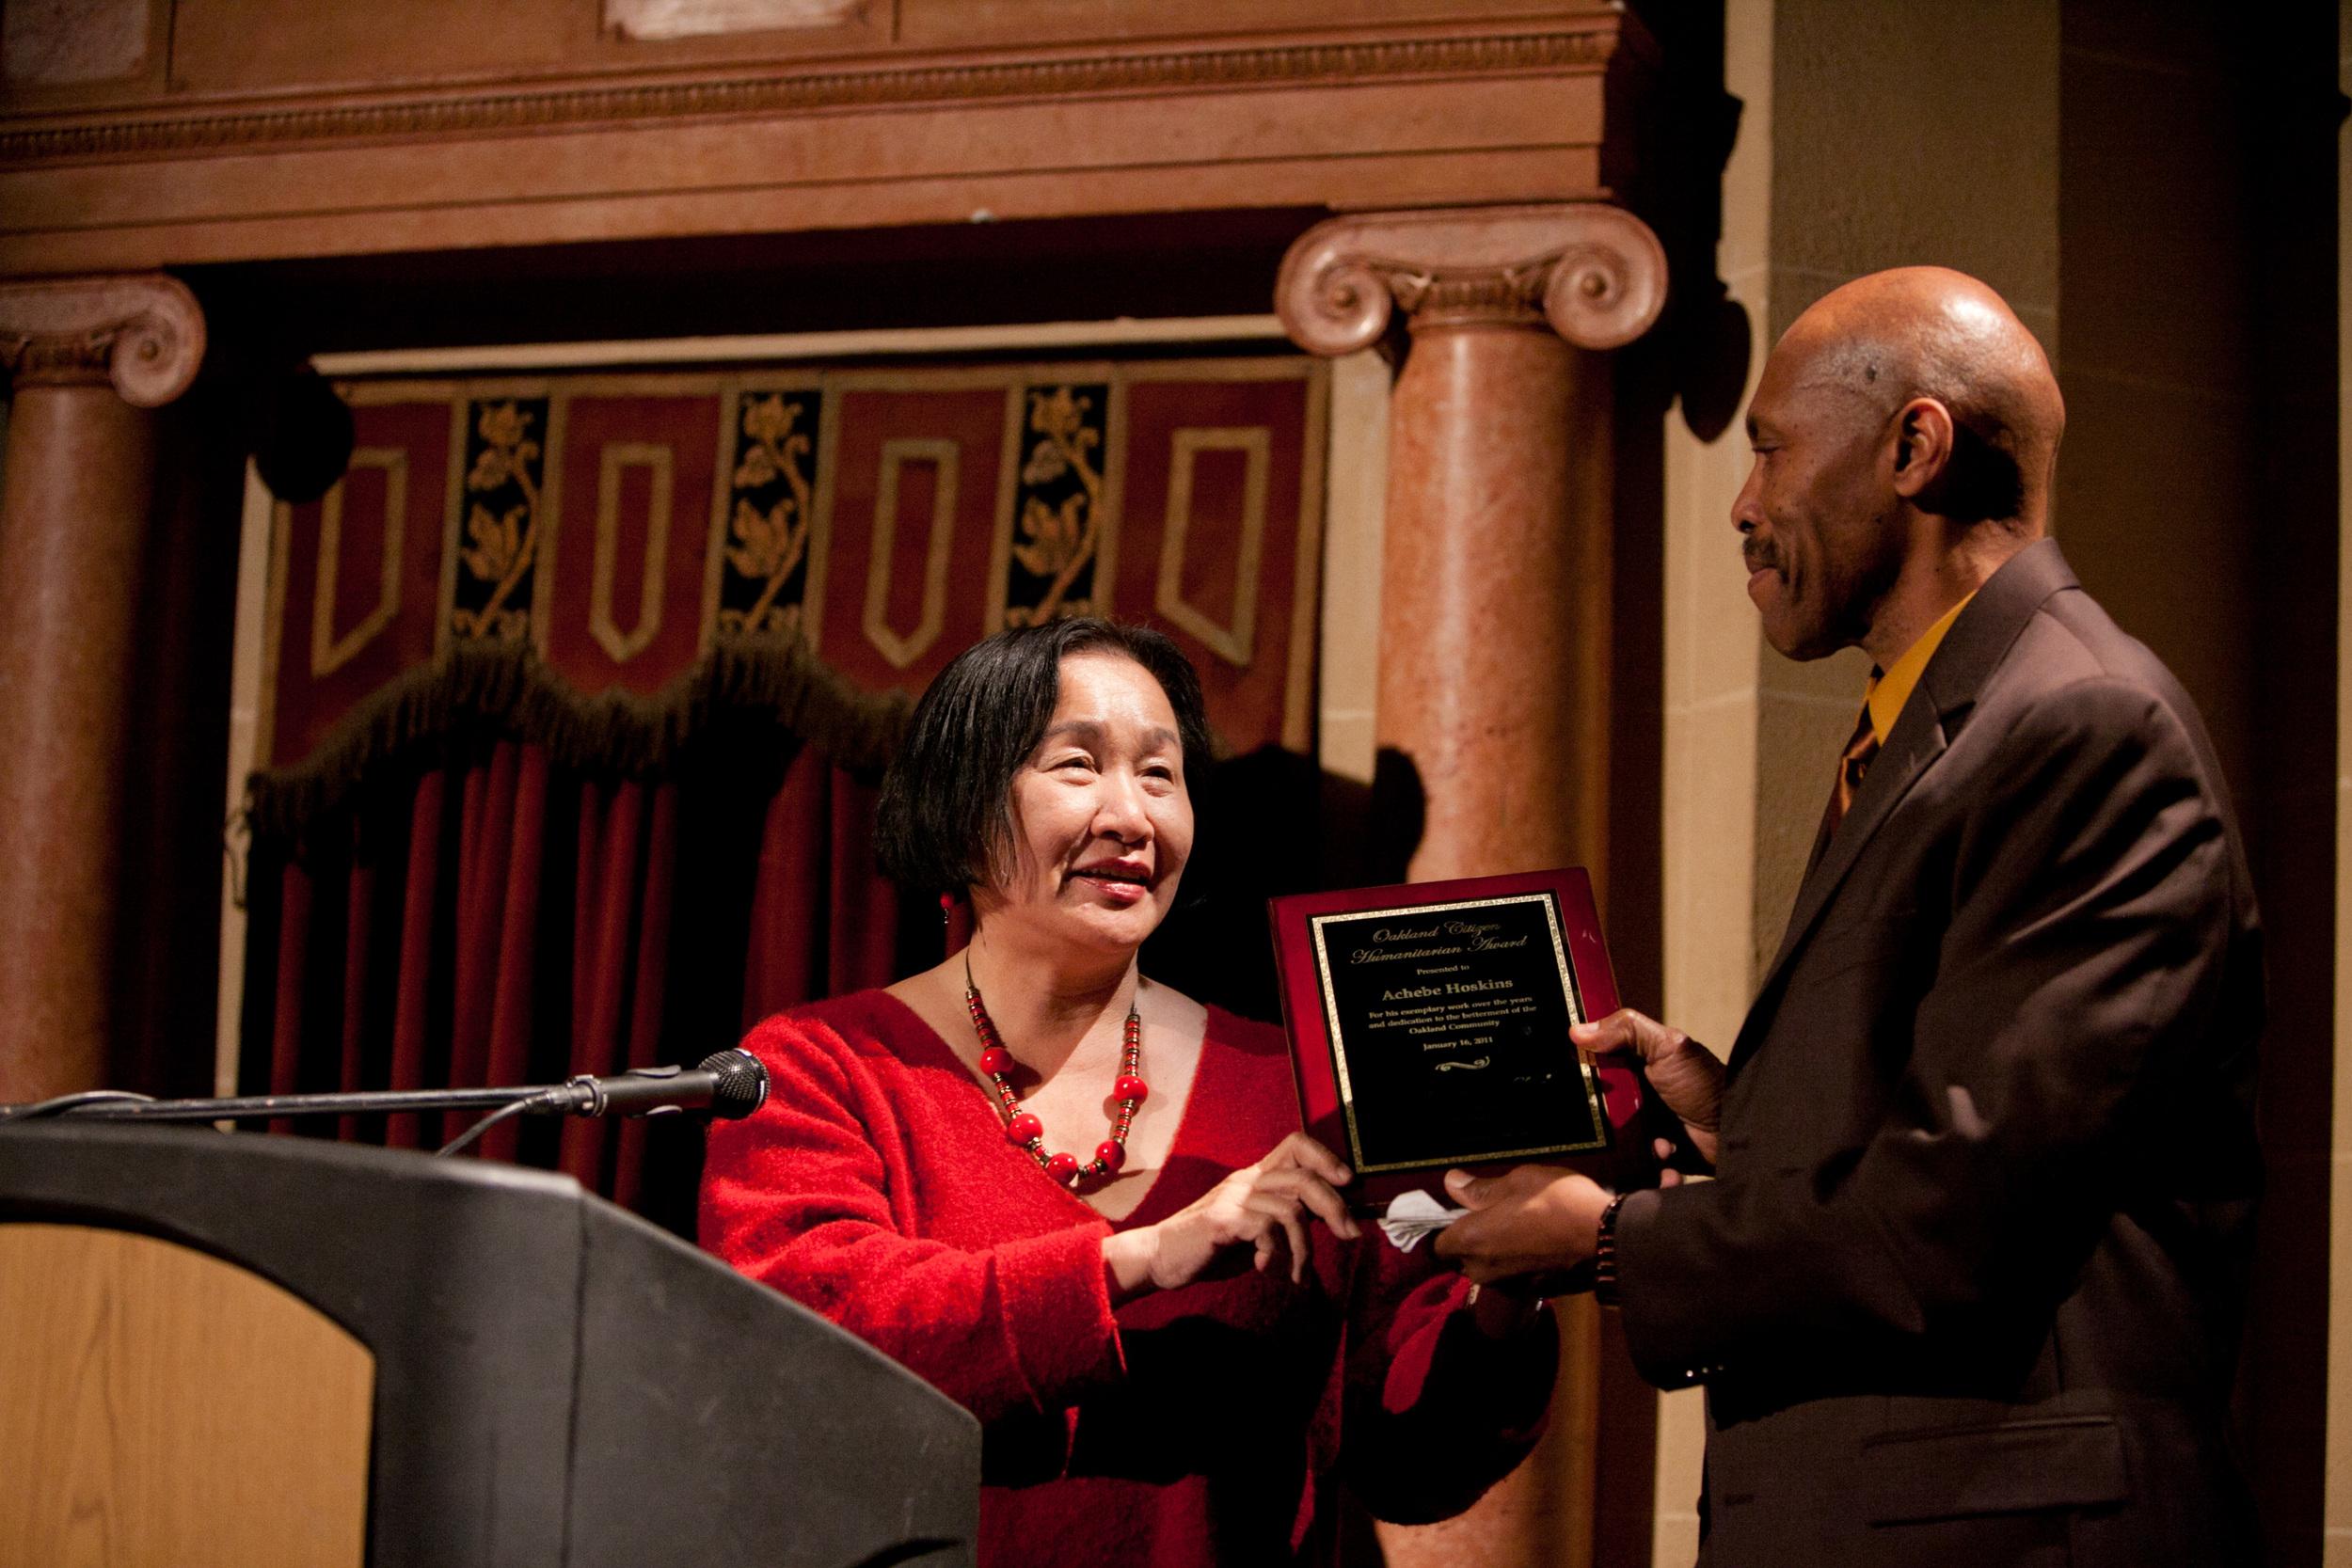 Mayor Jean Quan presents Achebe Hoskins the Humanitarian Award